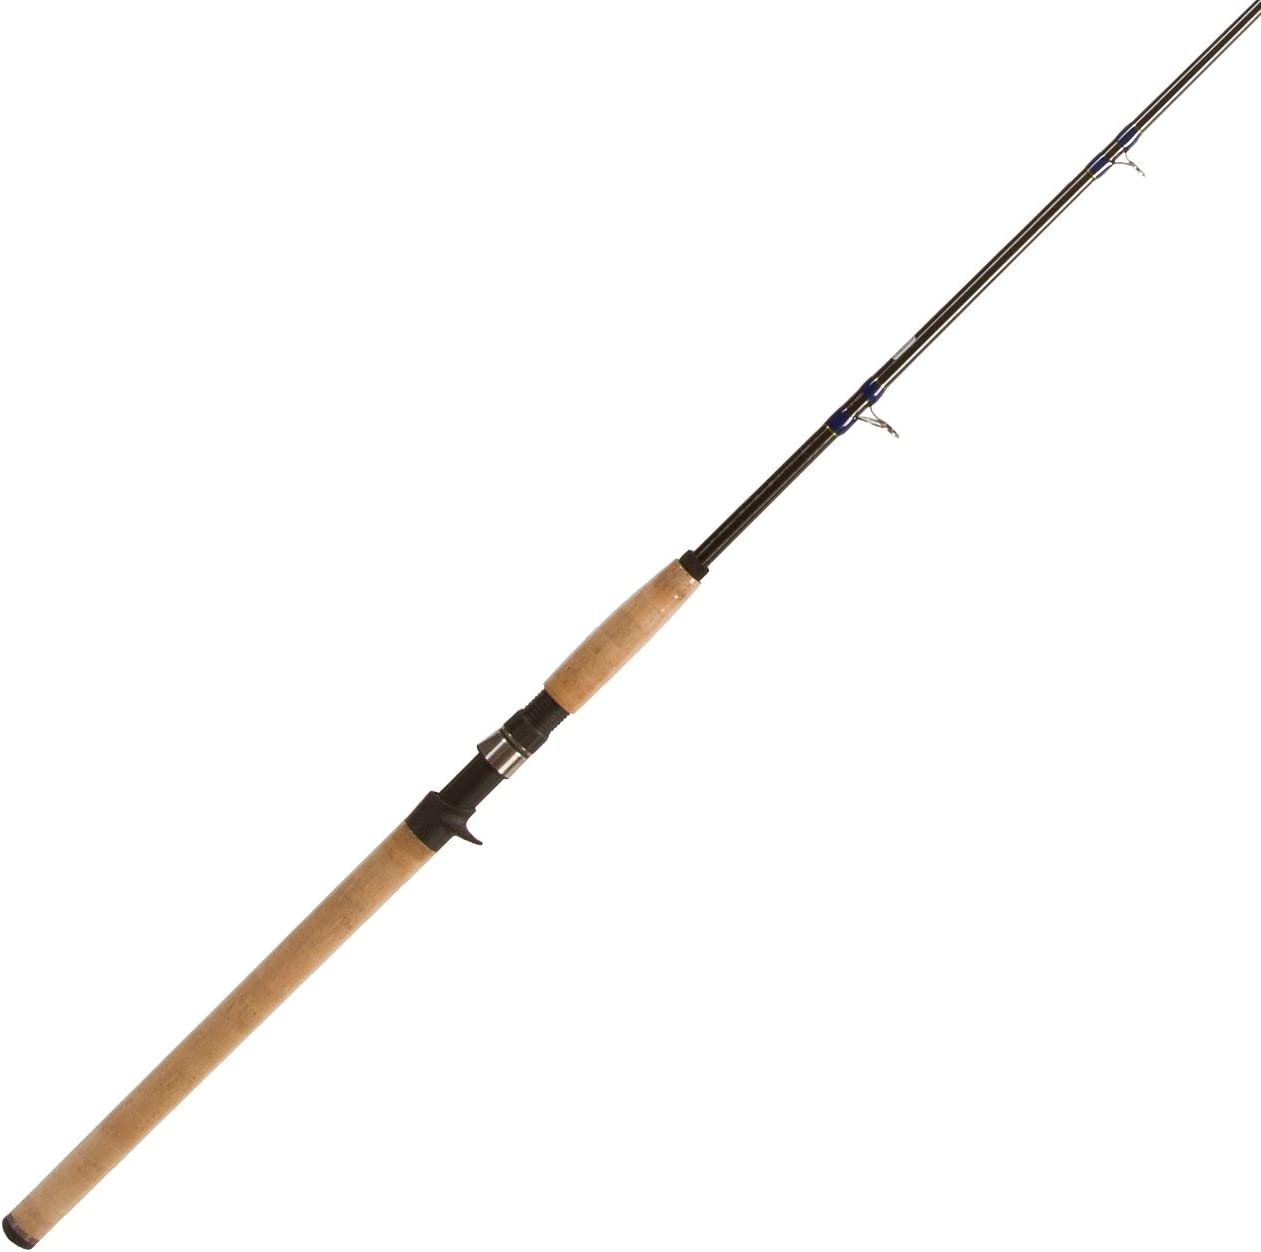 TICA MNSA Series Musky Fishing Rod